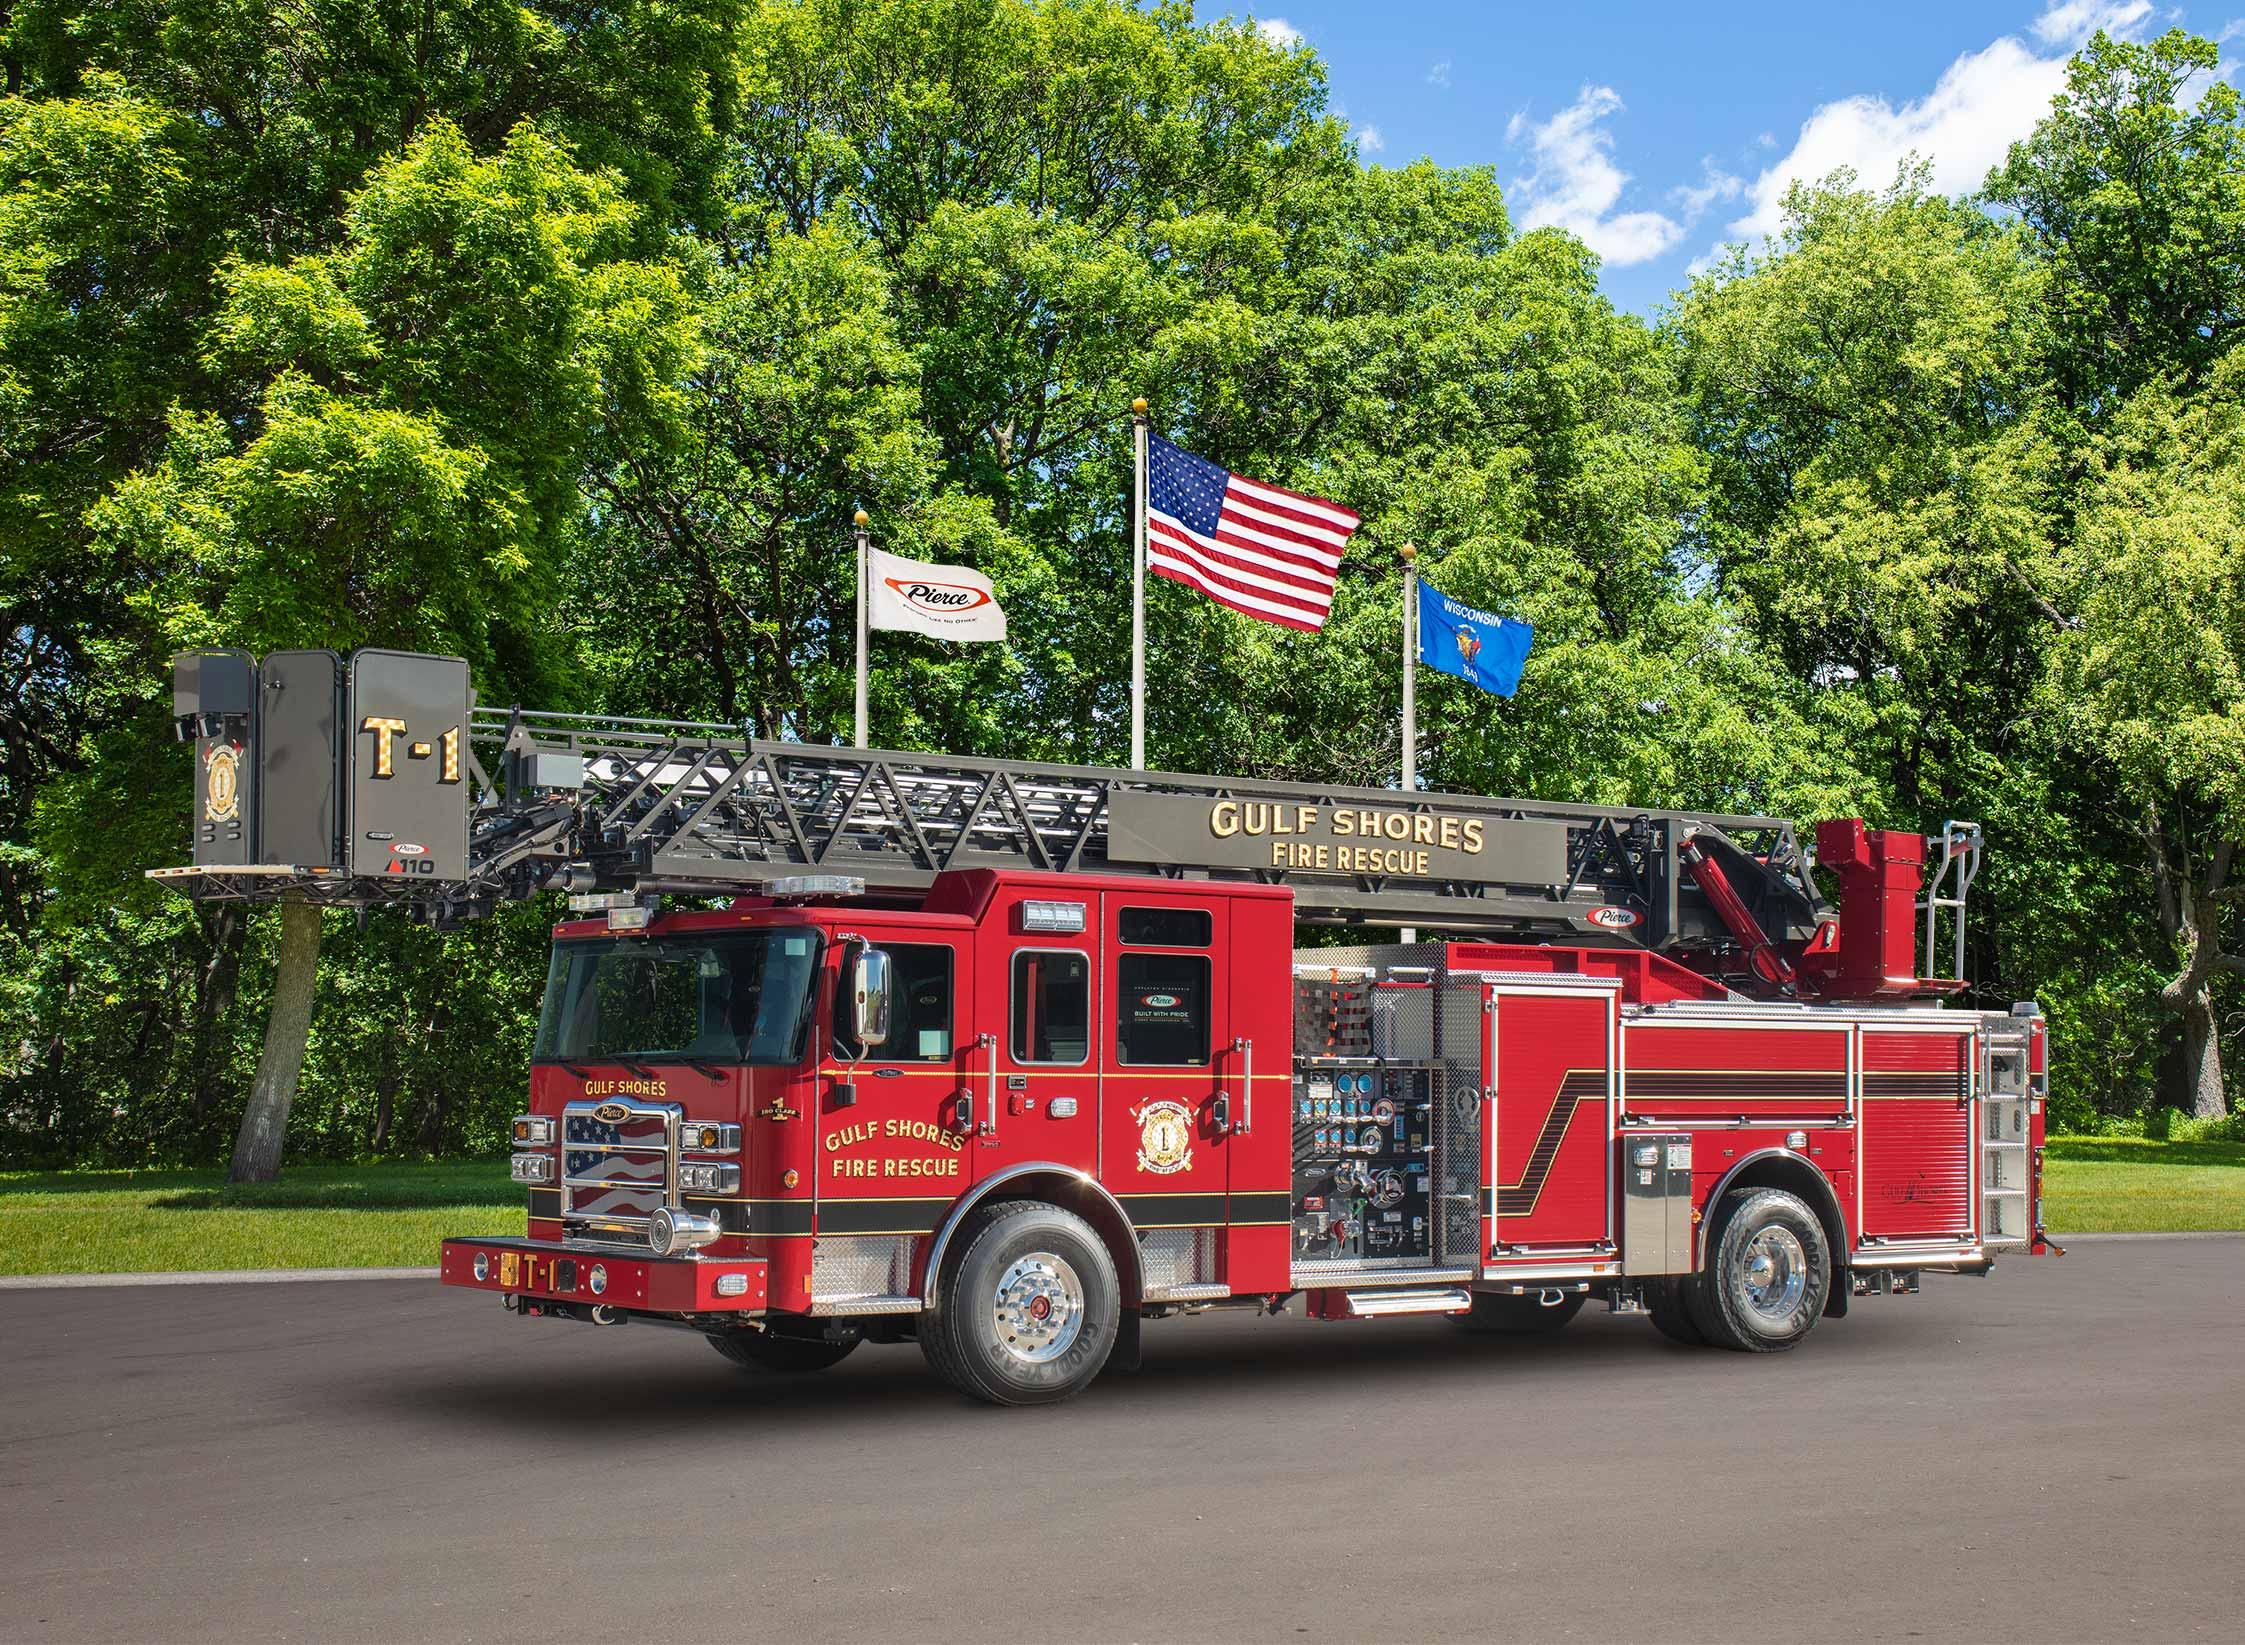 Gulf Shores Fire Rescue - Aerial